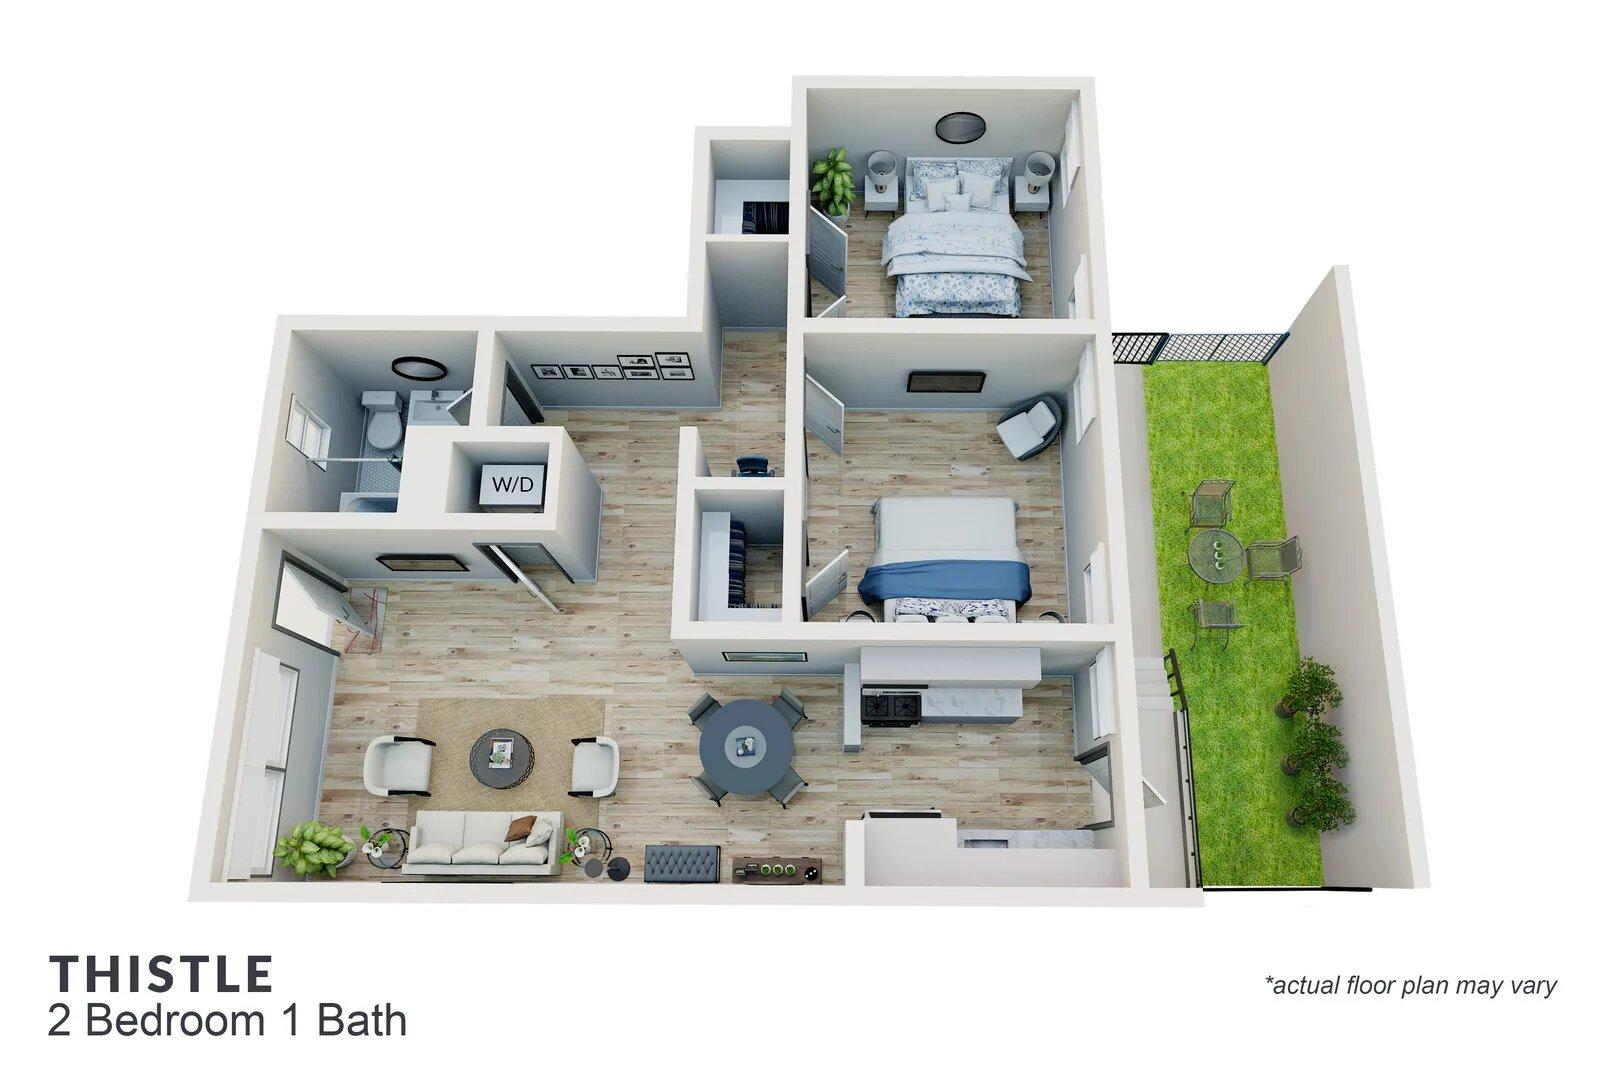 Thistle 2 bedroom 1 bath